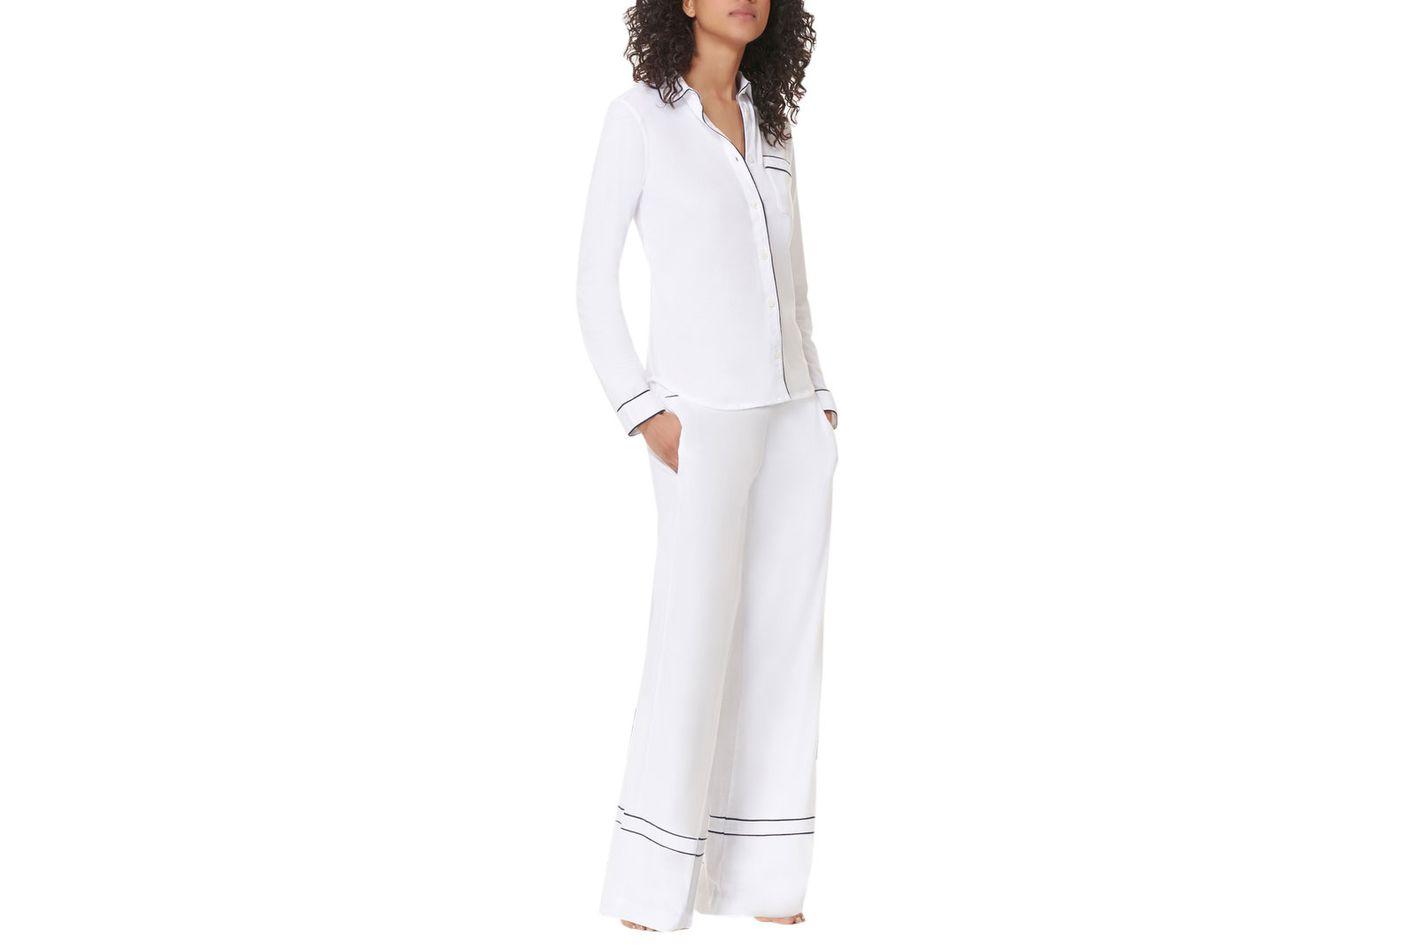 La Ligne Bonne Nuit Midnight Navy Pajama Shirt